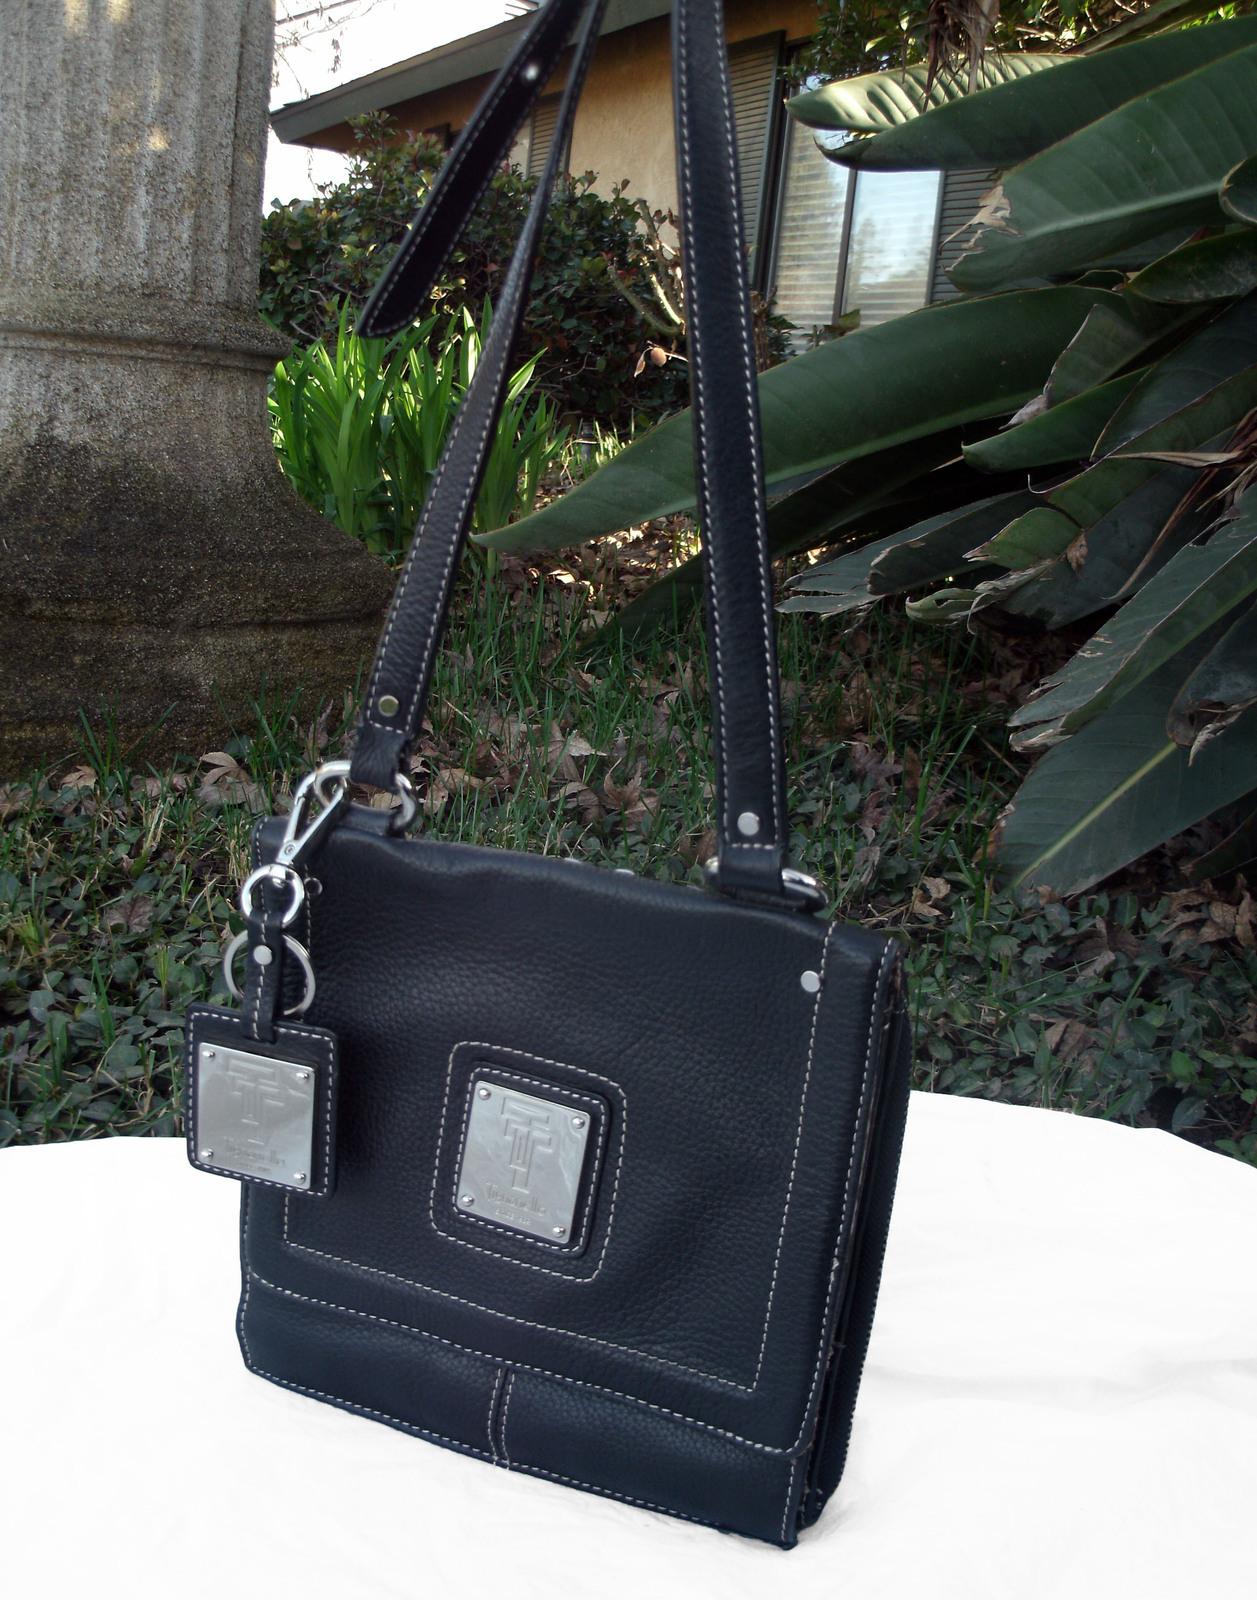 Tignanello Black Pebbled Leather Organizer Crossbody built in Wallet image 2